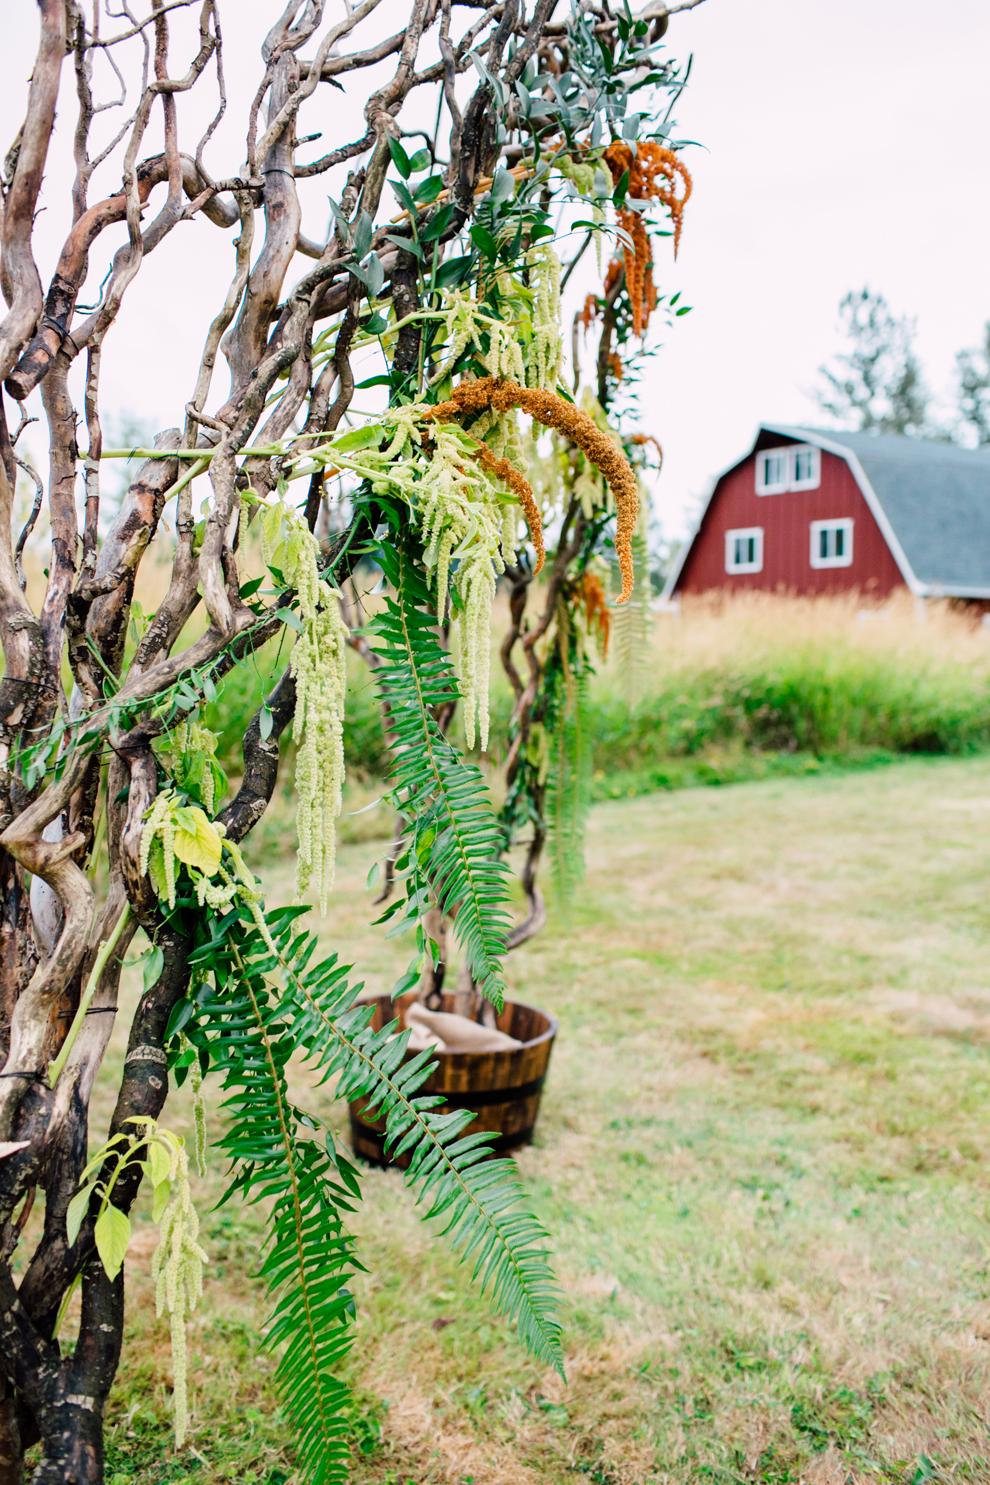 004-anderson-acres-wedding-venue-bellingham-washingotn-katheryn-moran-photography.jpg